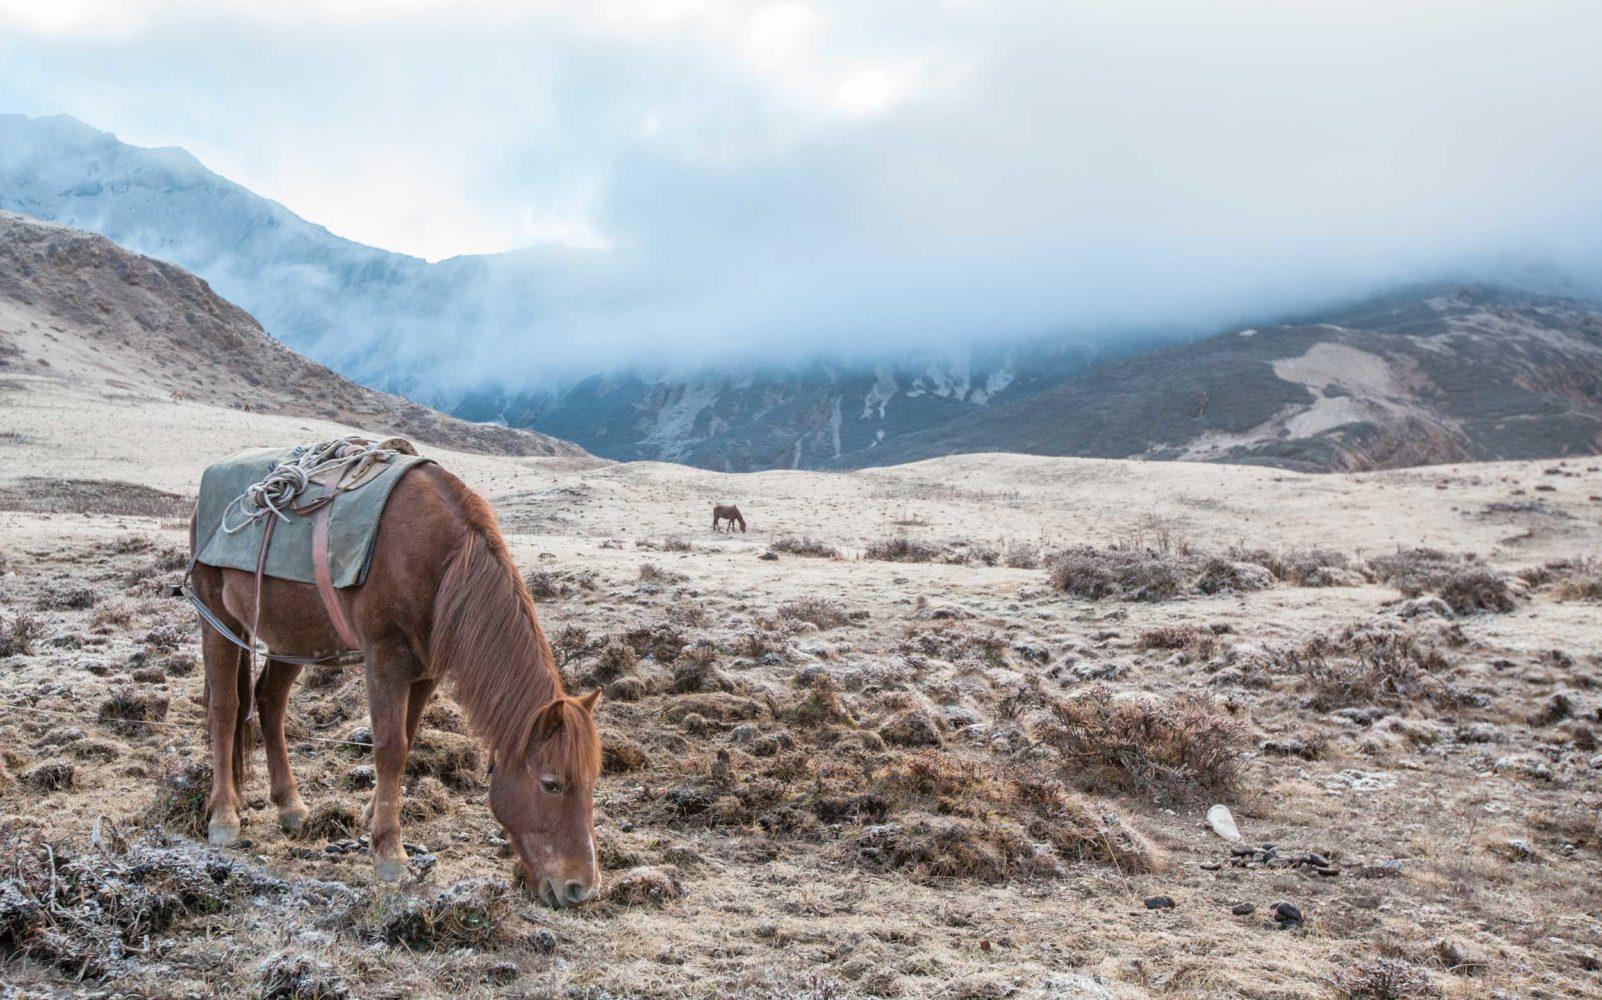 A Digital Detox Trip to the Kingdom of Bhutan